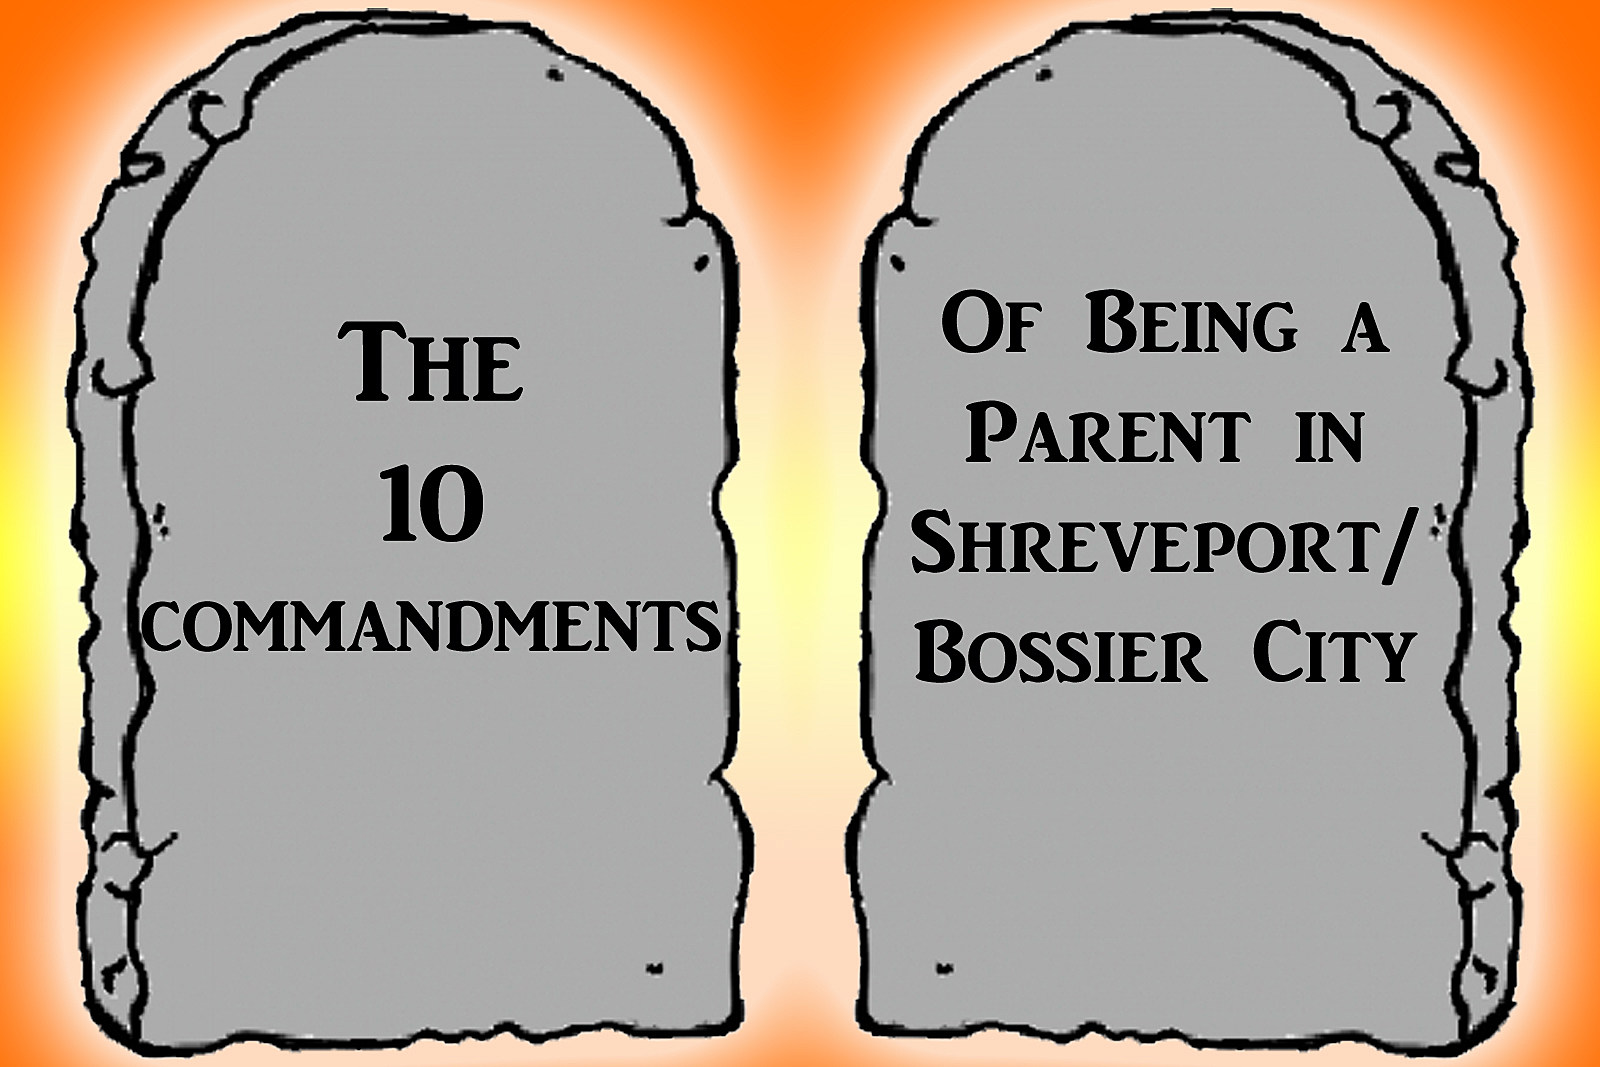 10 commandments image